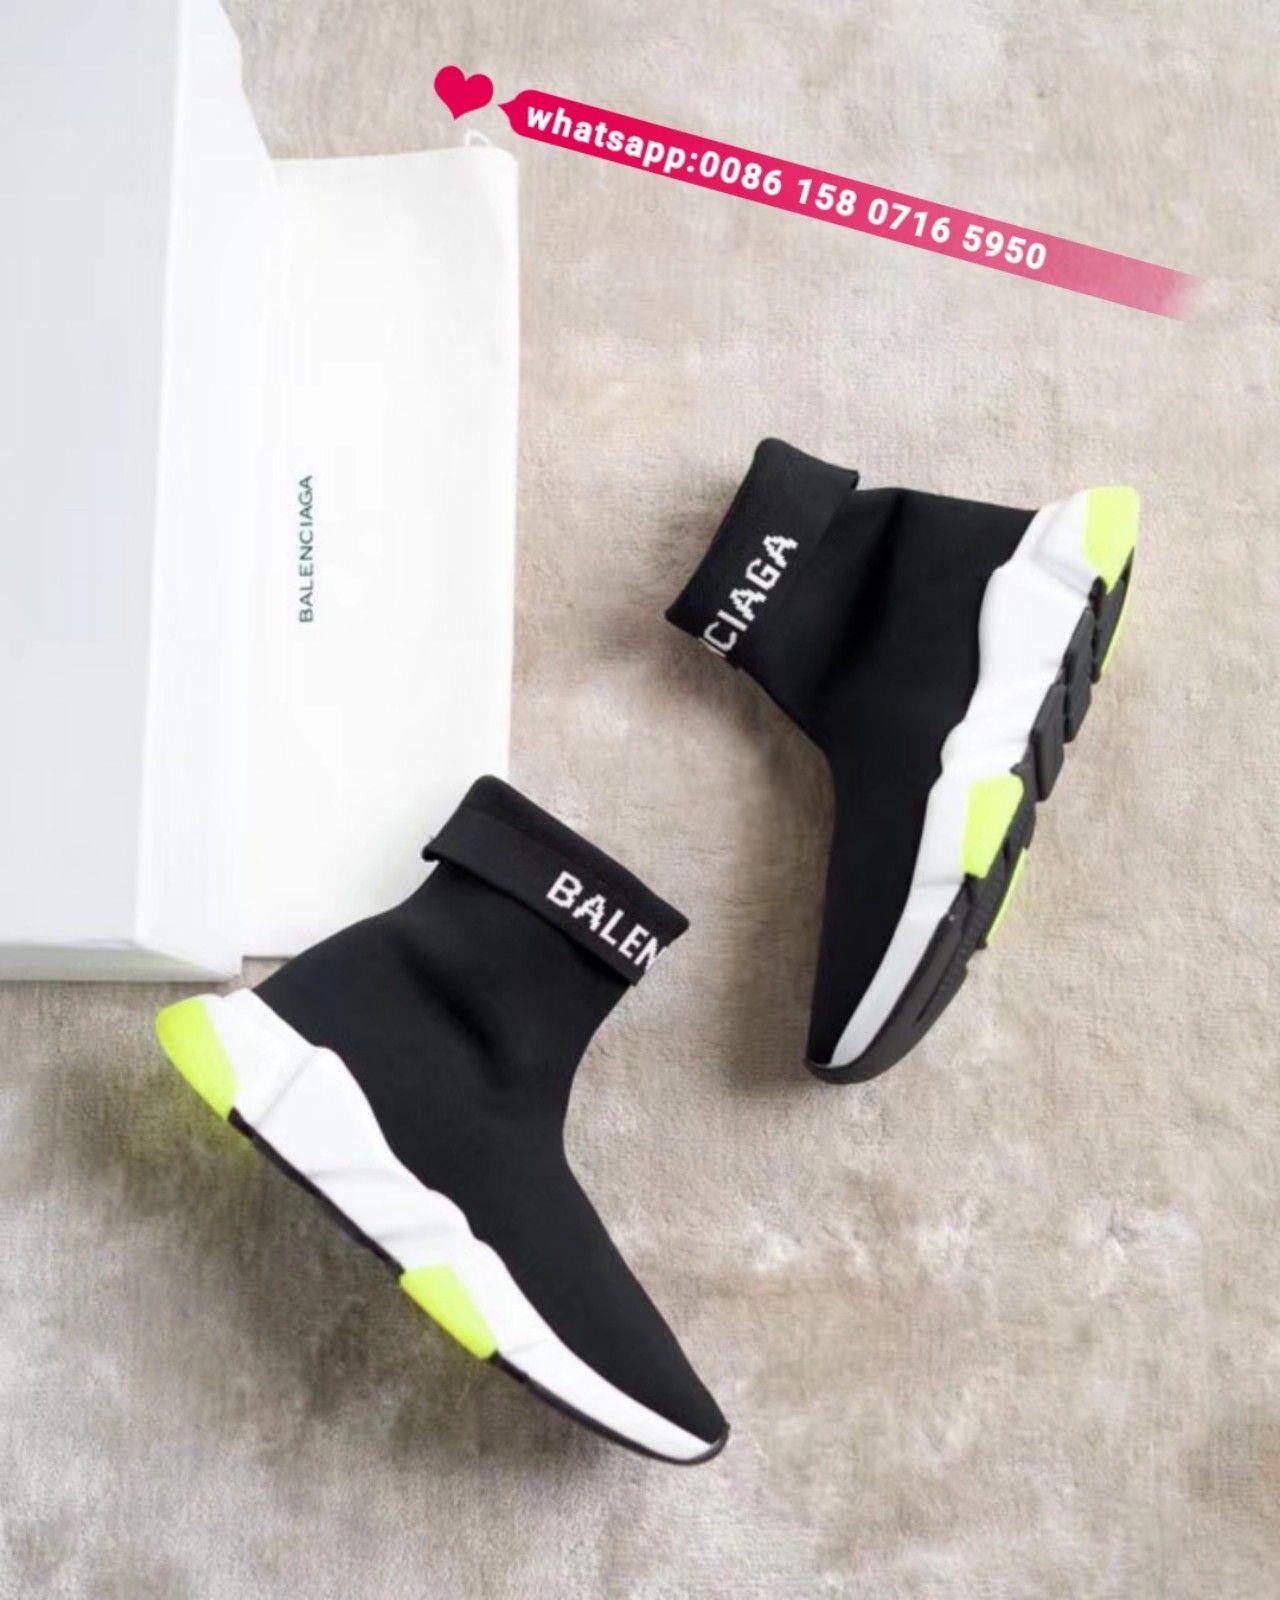 balenciga speed sock trainers sneakers